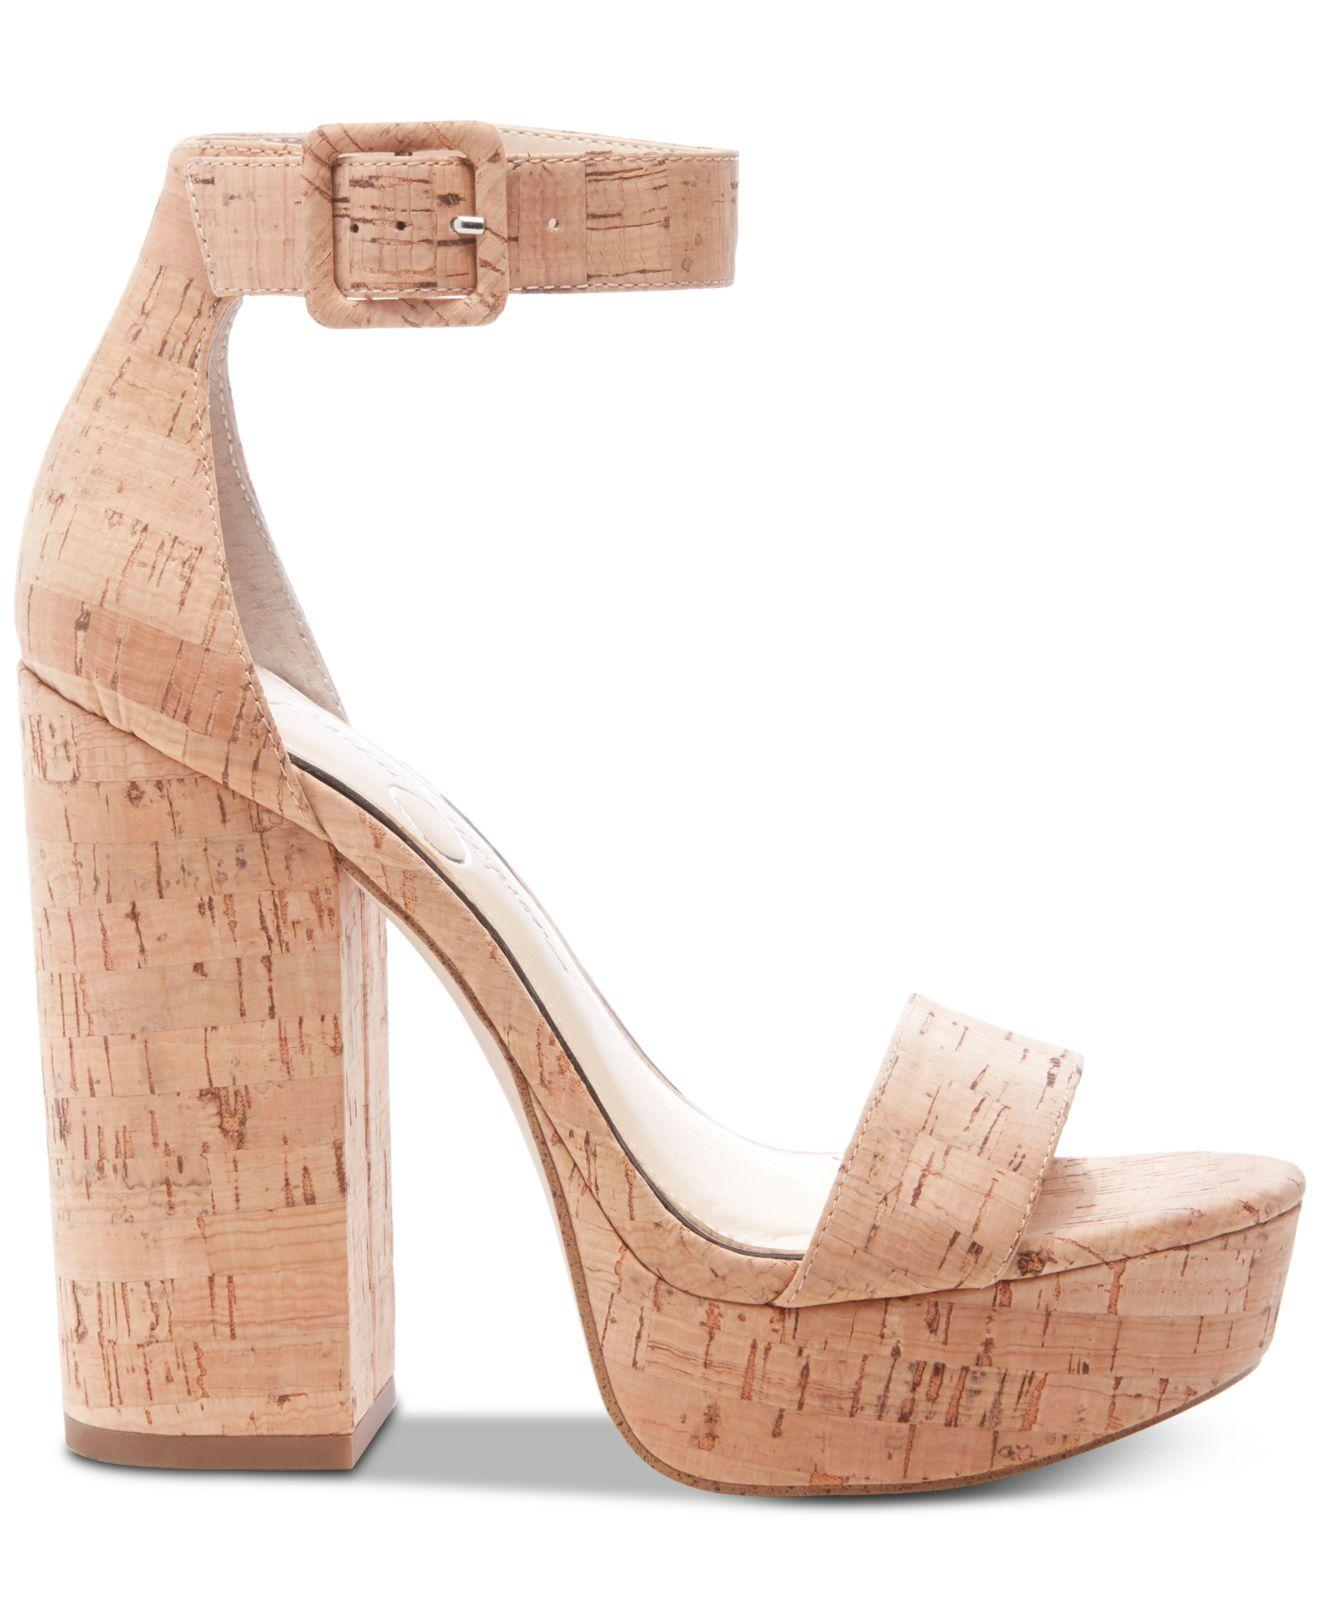 8fc82afd75 Jessica Simpson Caiya Block Heel Sandal in Natural - Lyst